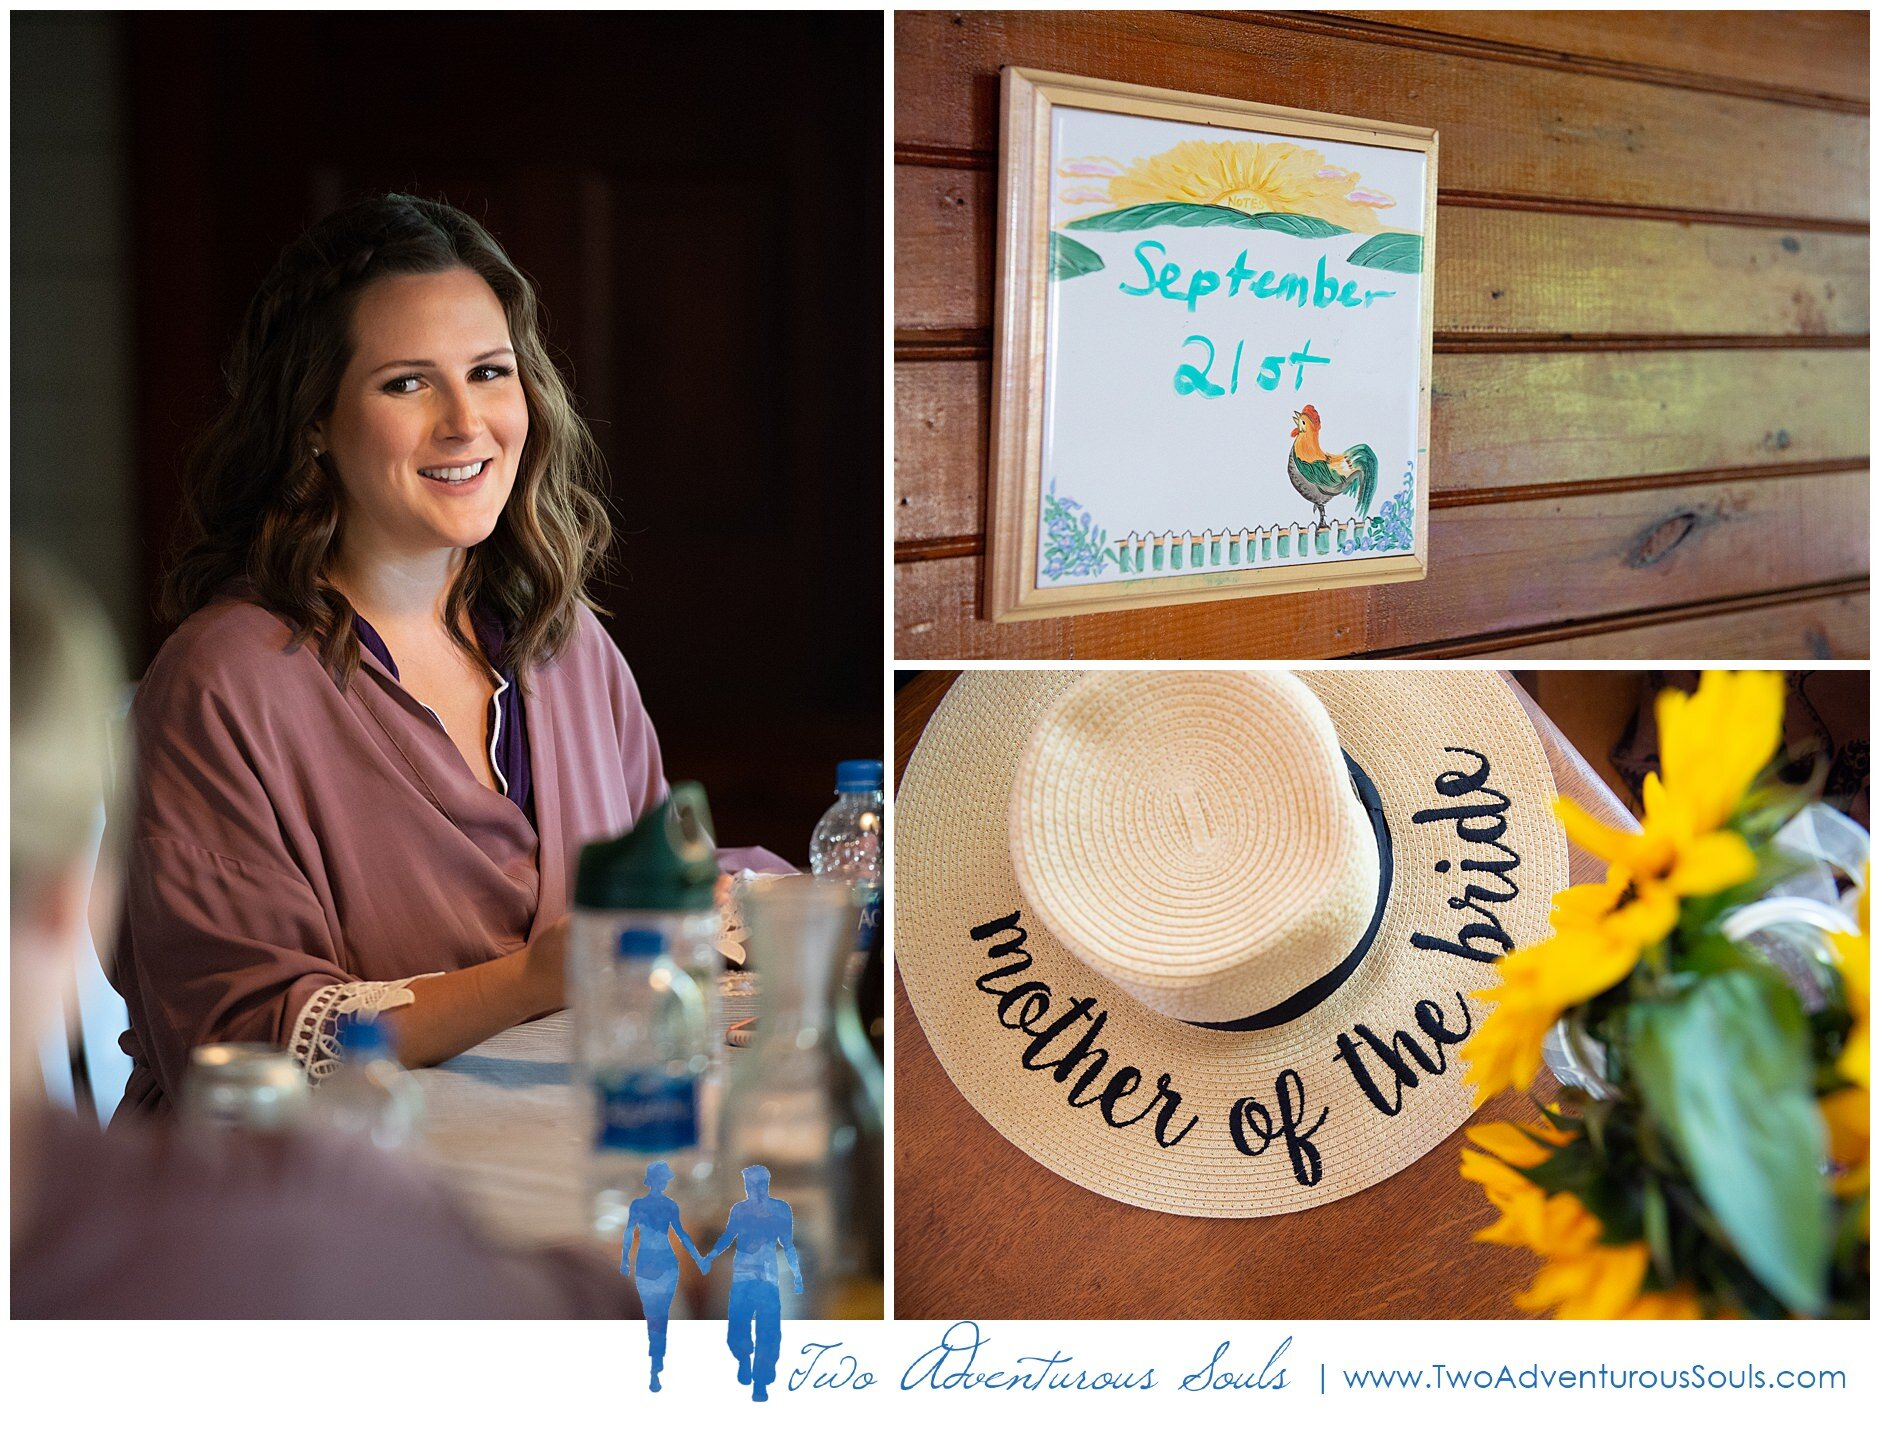 Breakwater Inn and Spa Wedding Photographers, Kennebunkport Wedding Photographers, Two Adventurous Souls- 092119_0002.jpg